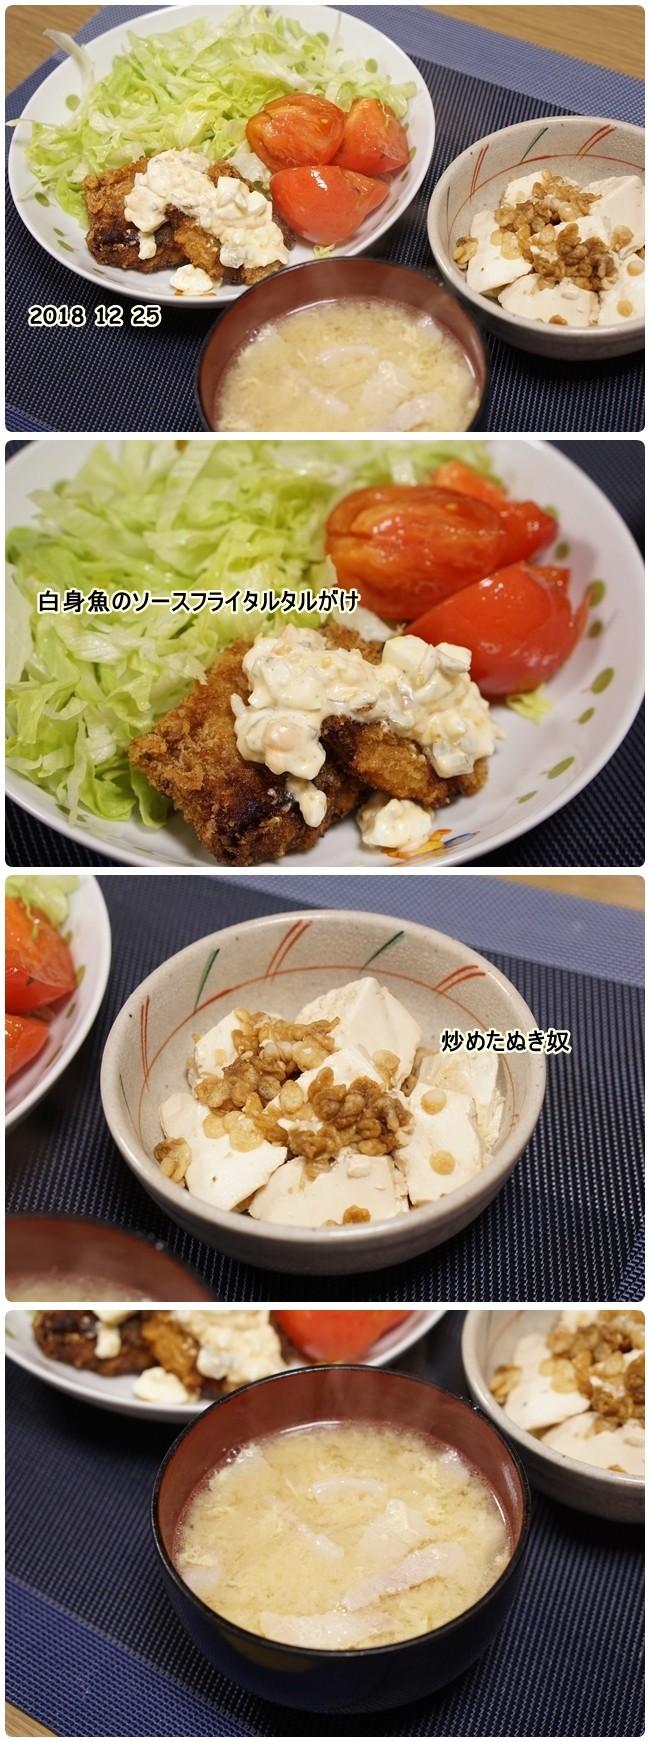 ■DSC01794-vert